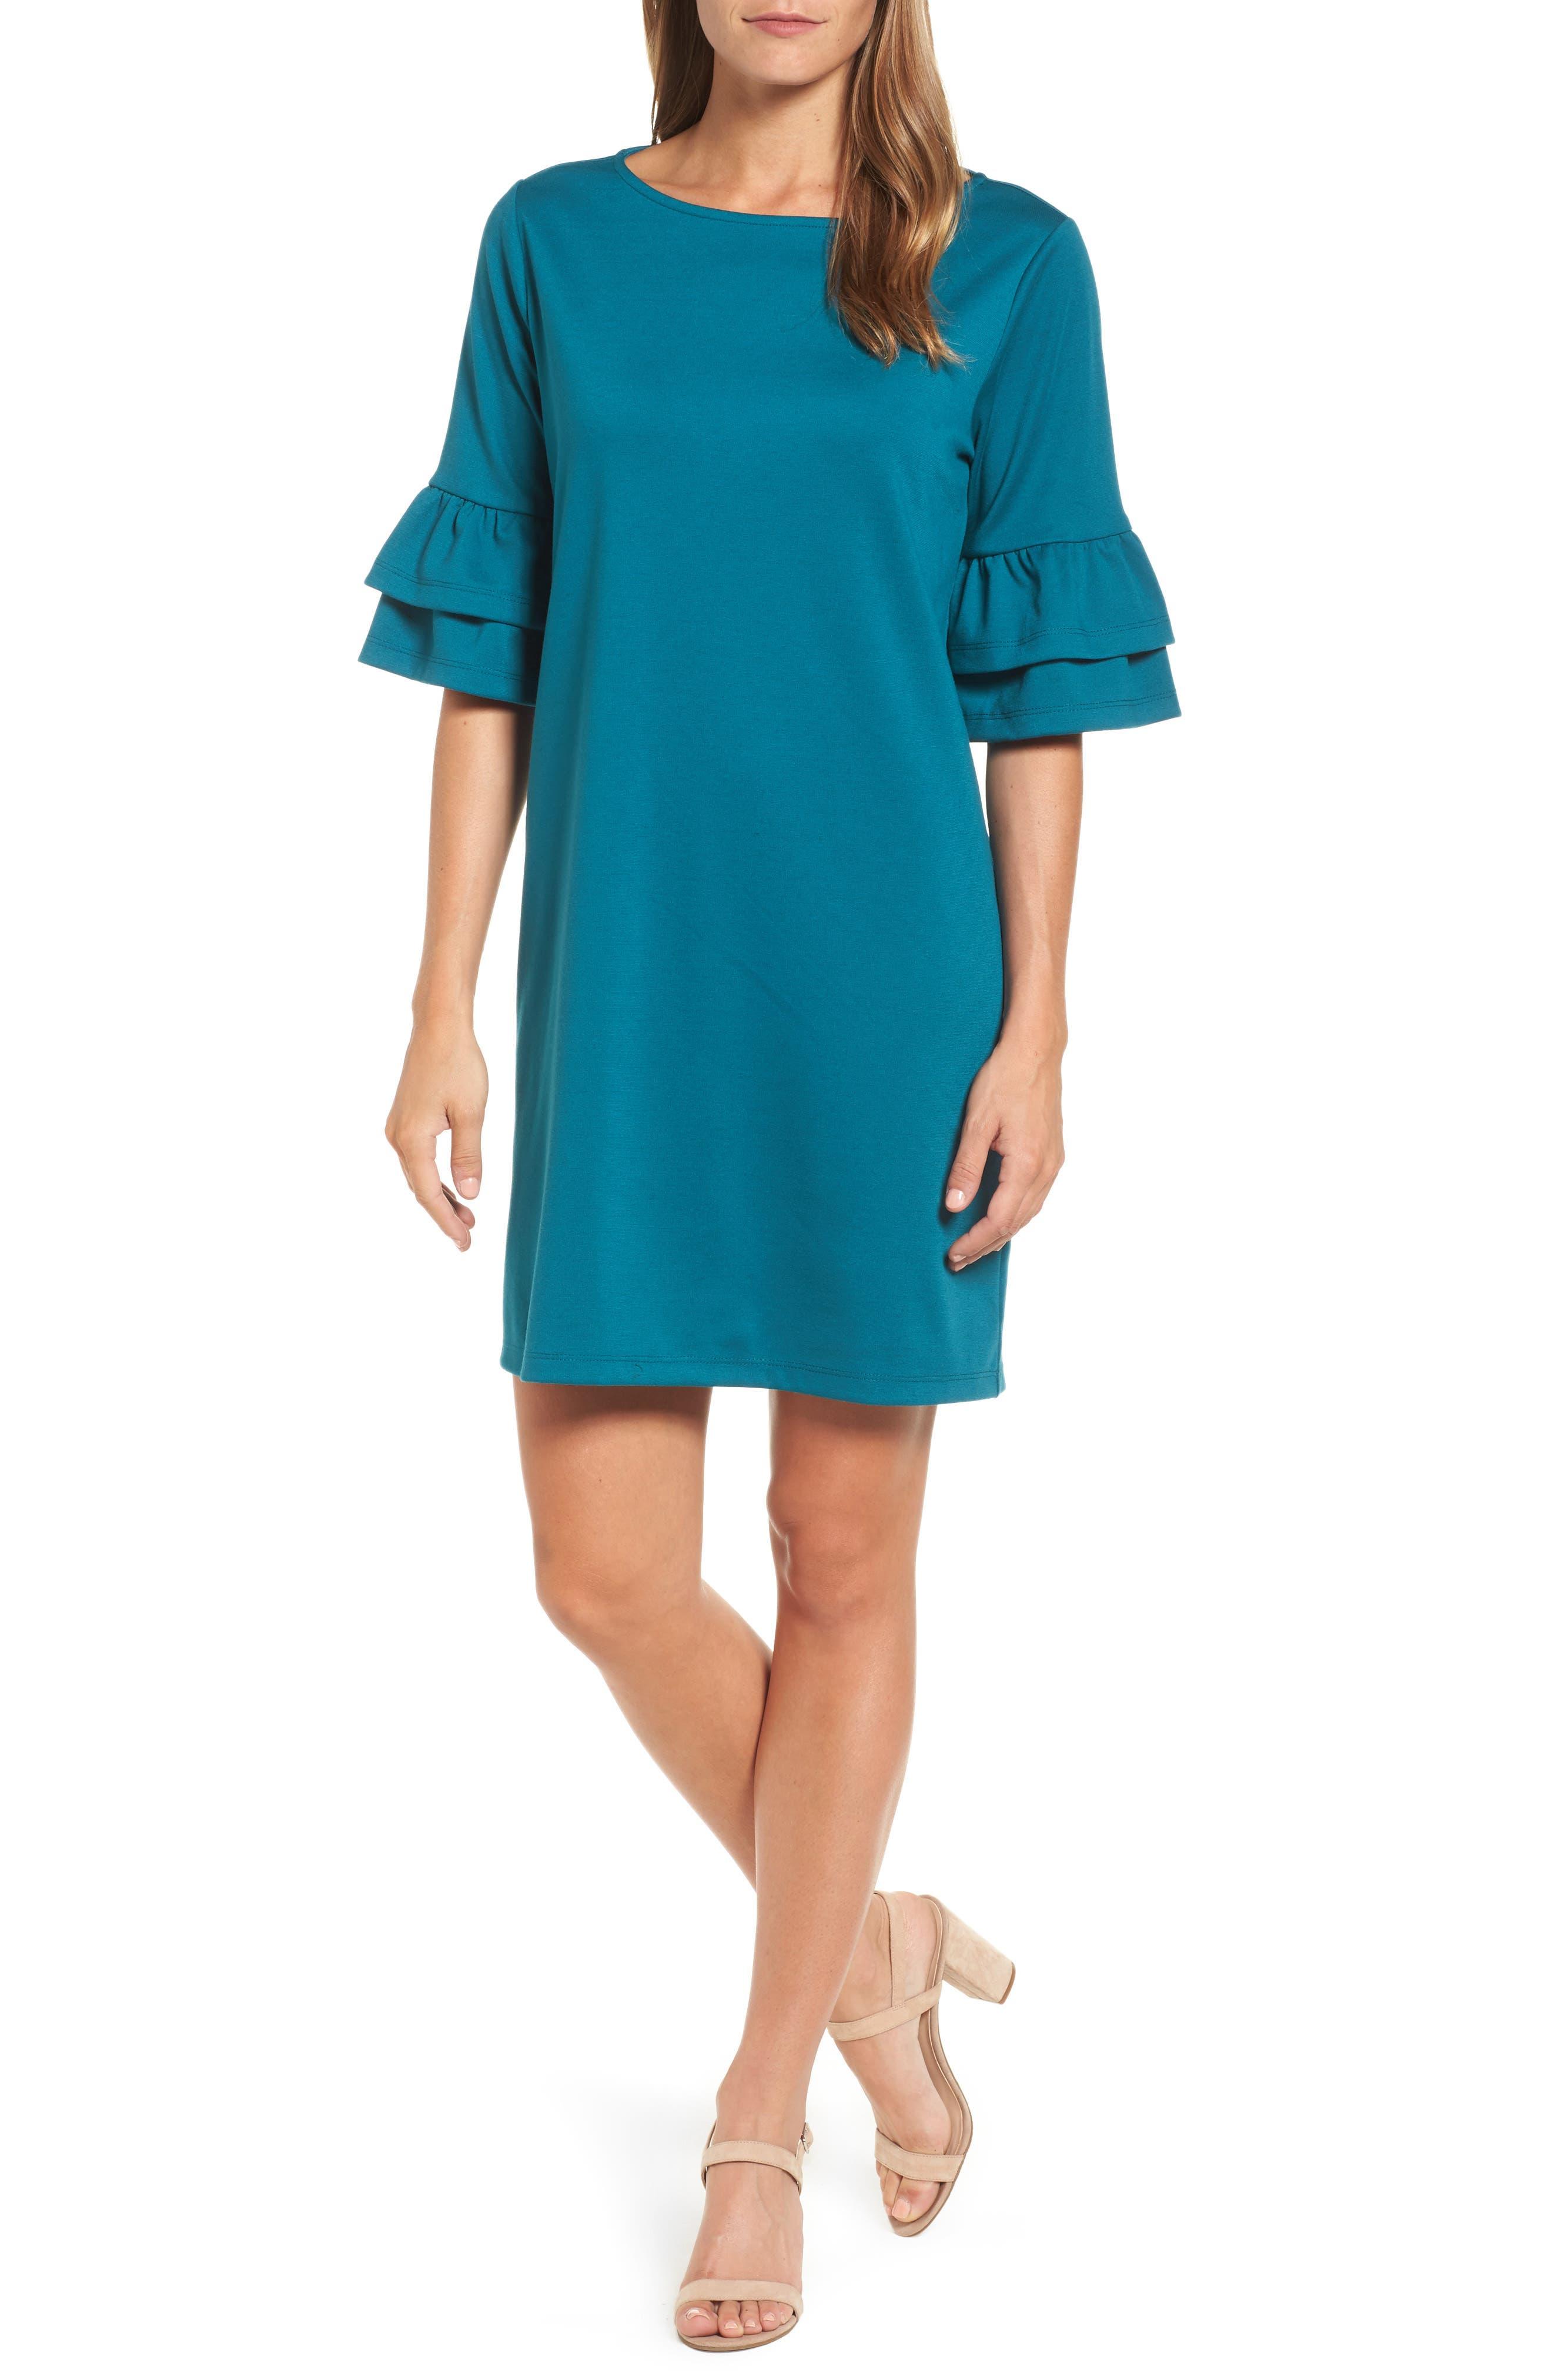 Ruffle Sleeve Shift Dress,                         Main,                         color, 440